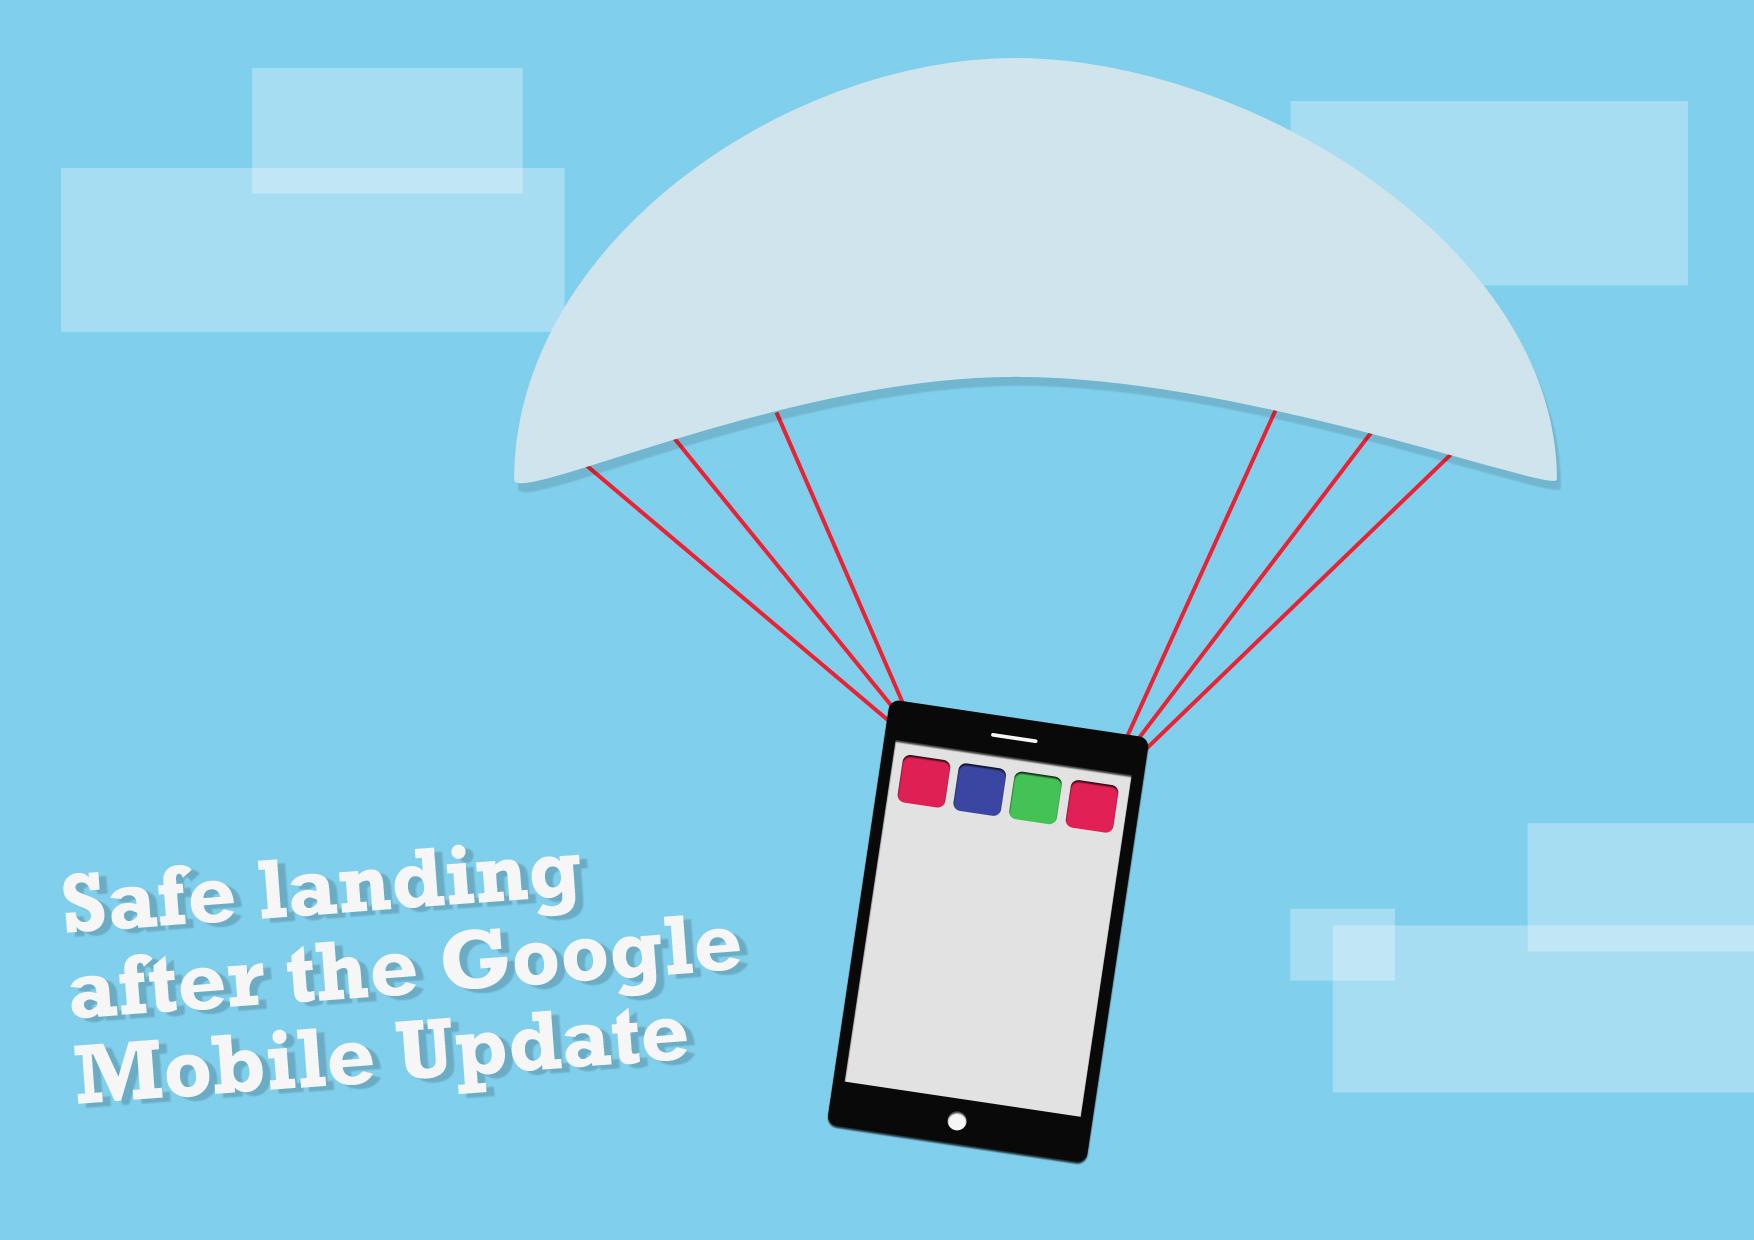 Google mobile update phone